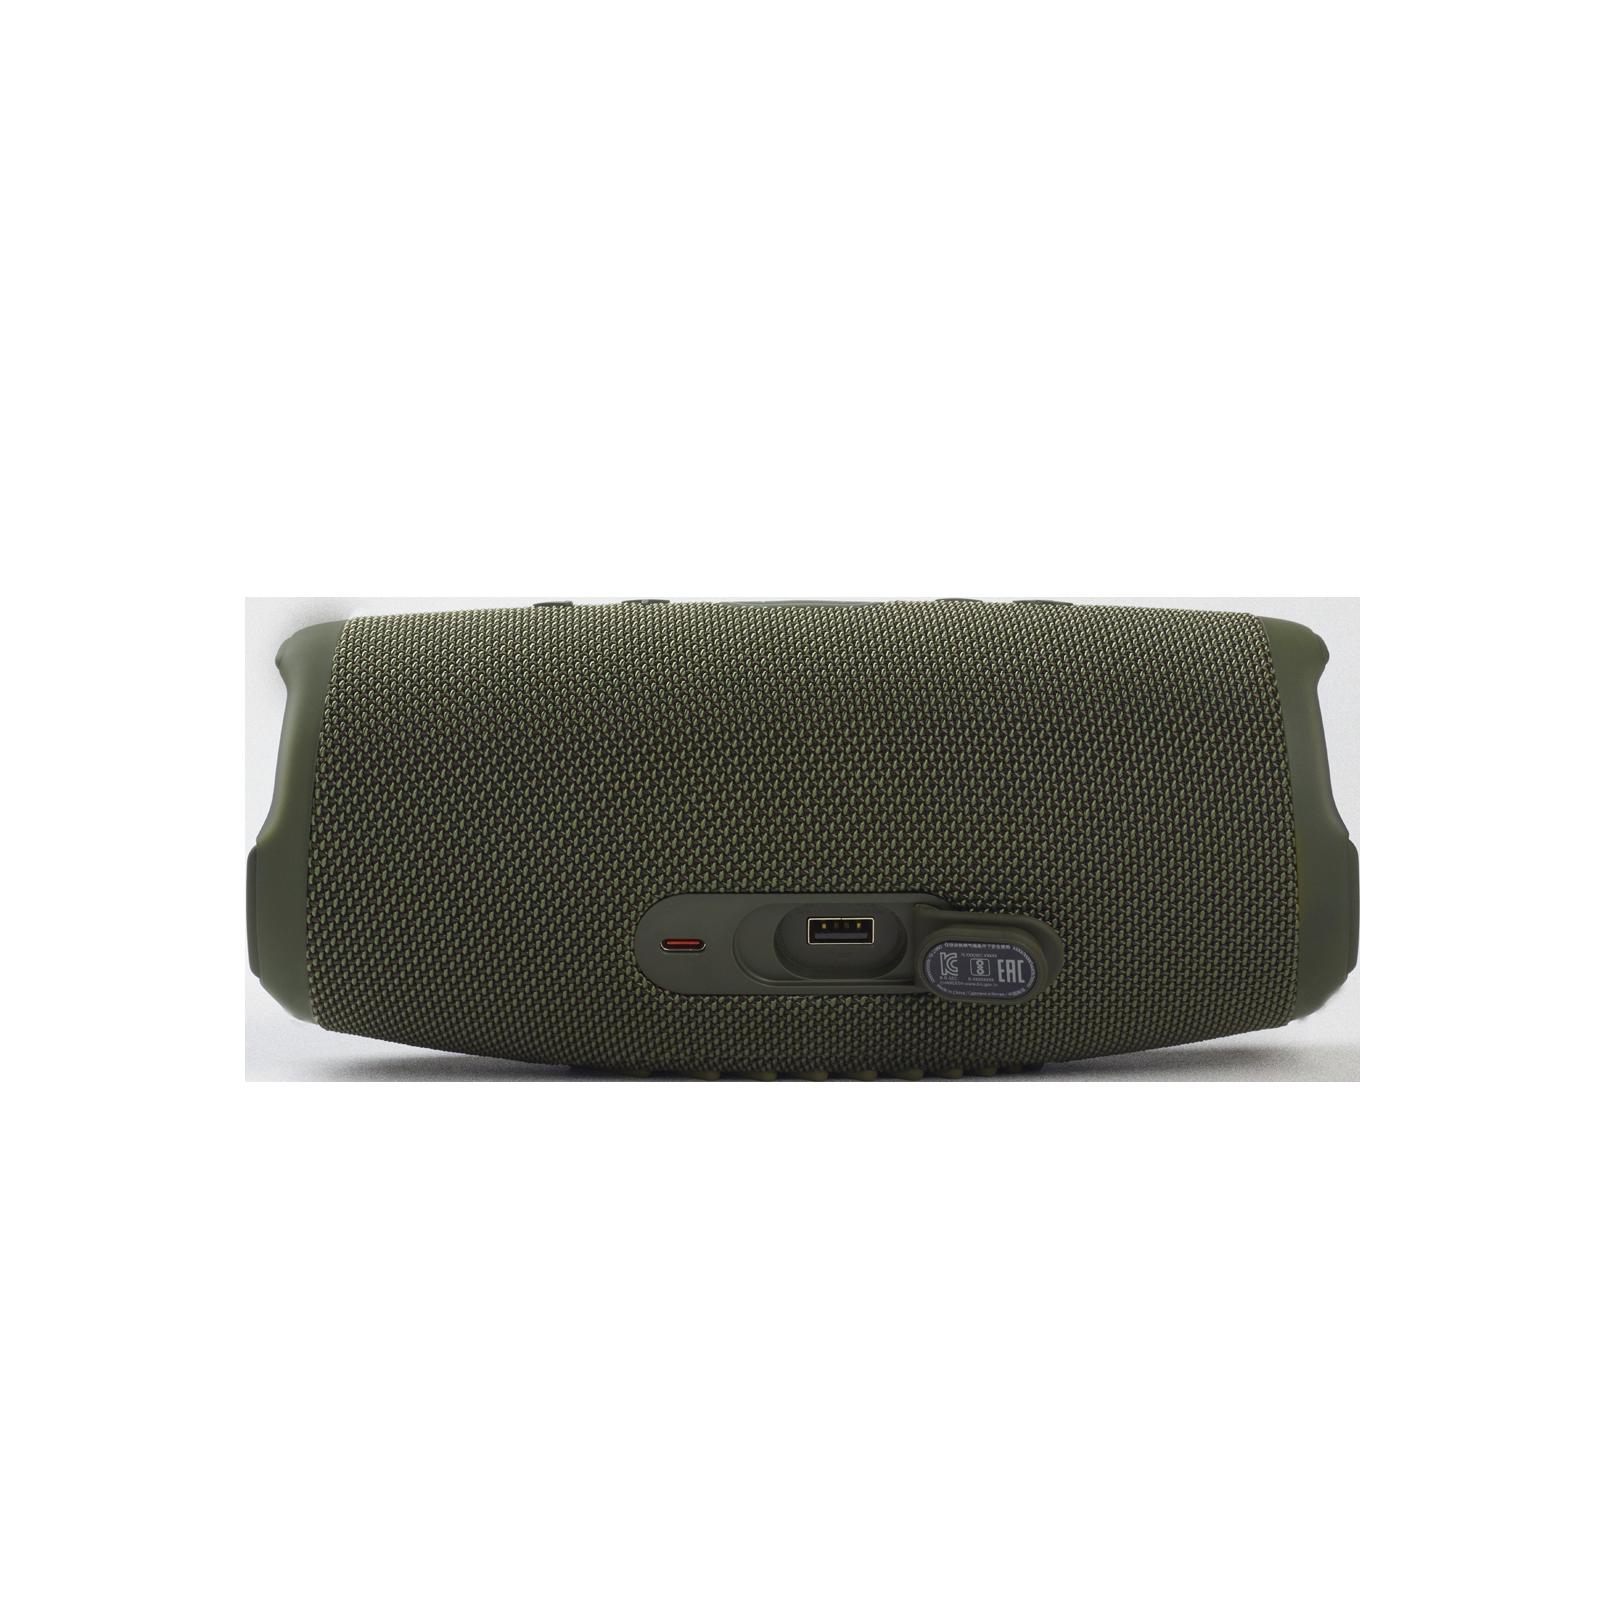 JBL CHARGE 5 - Forest Green - Portable Waterproof Speaker with Powerbank - Detailshot 1